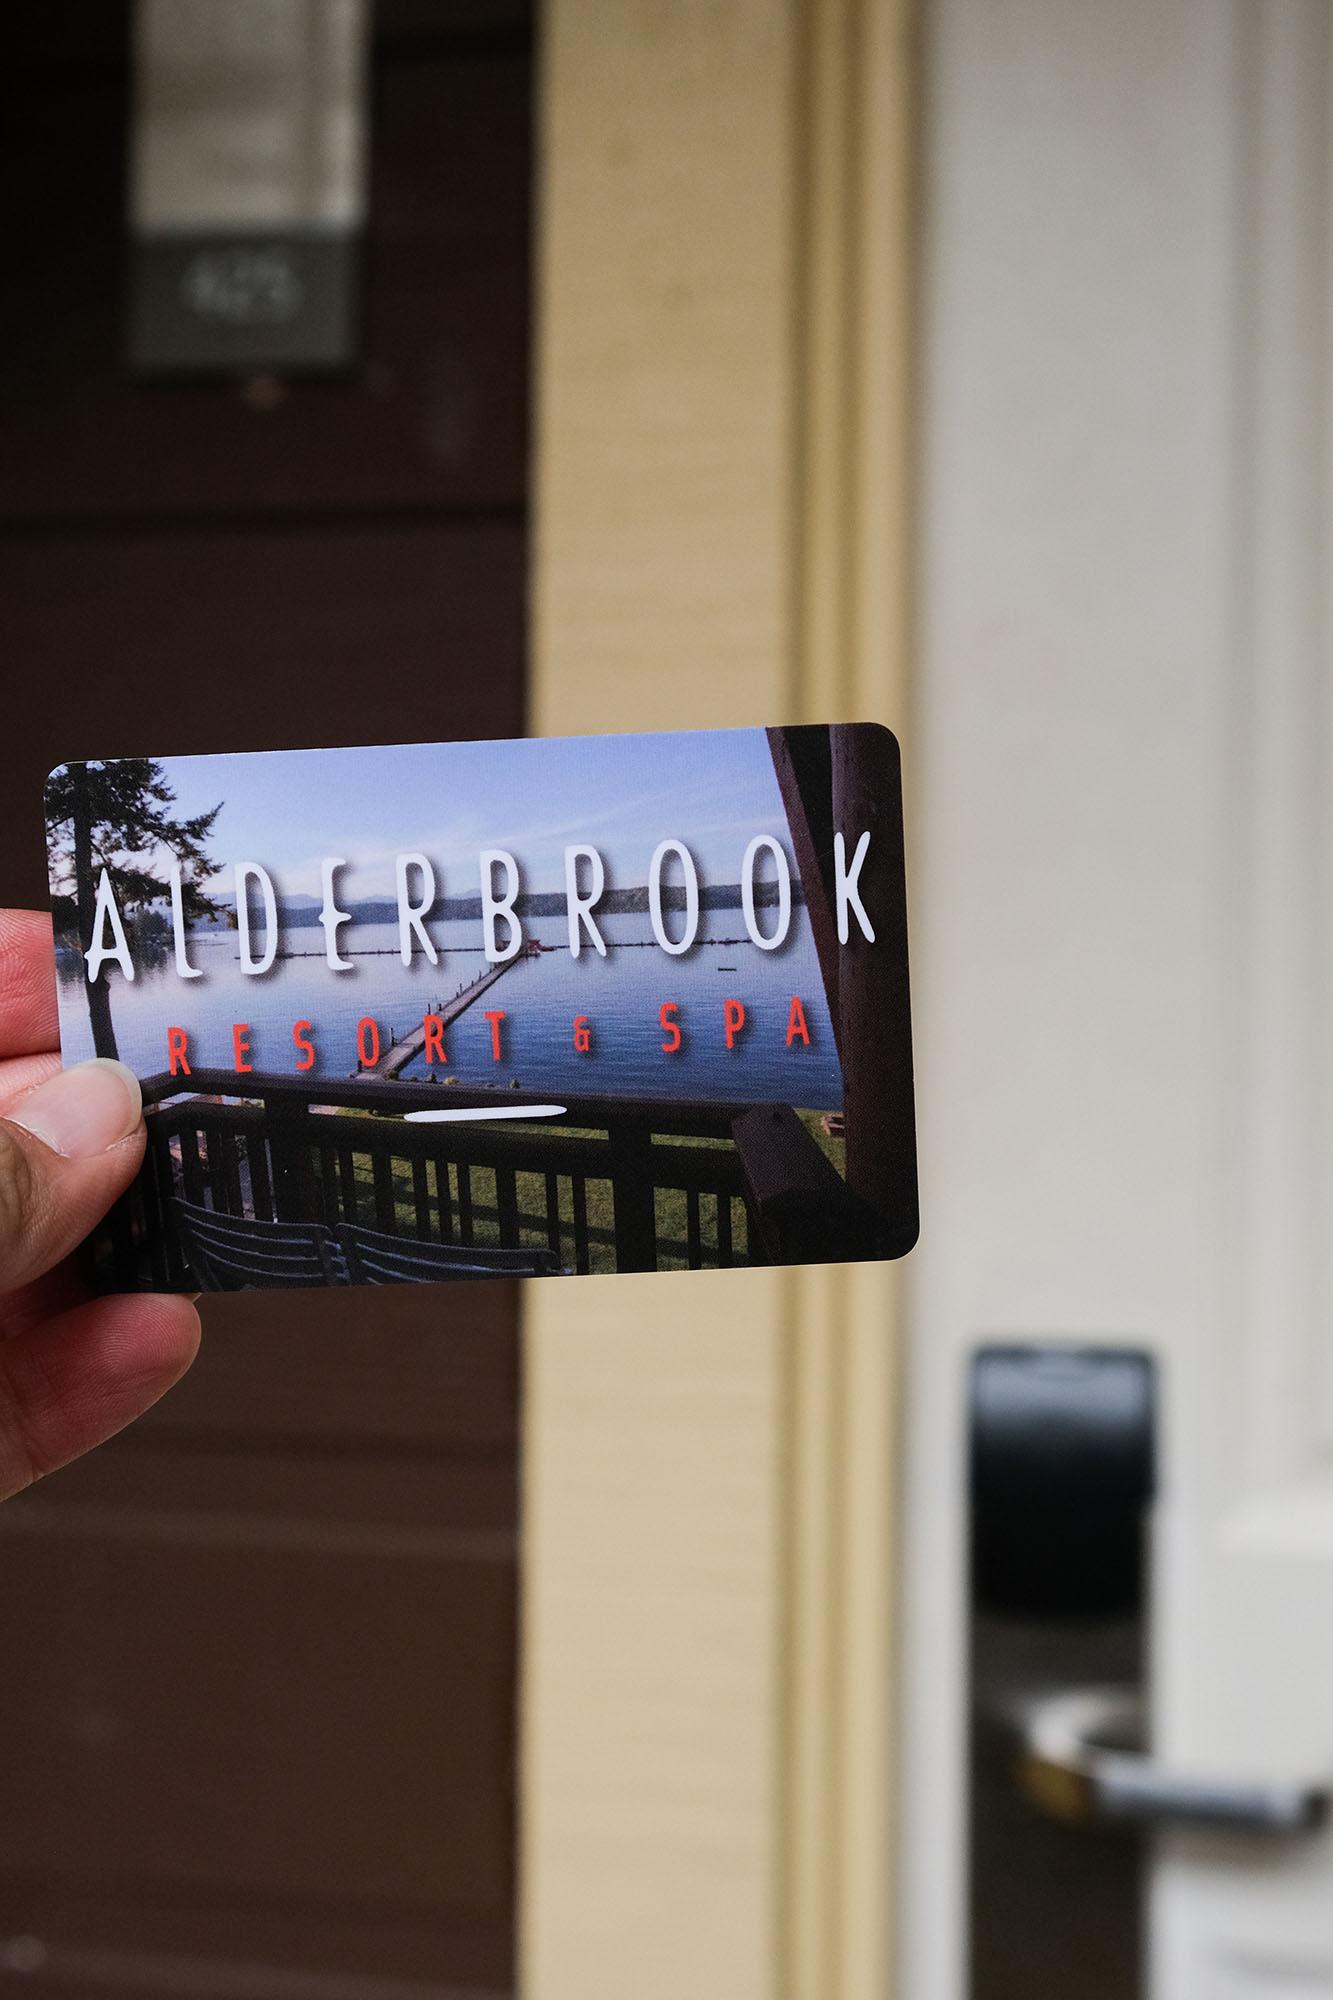 Pratt_Alderbrook Resort_001 copy.jpg